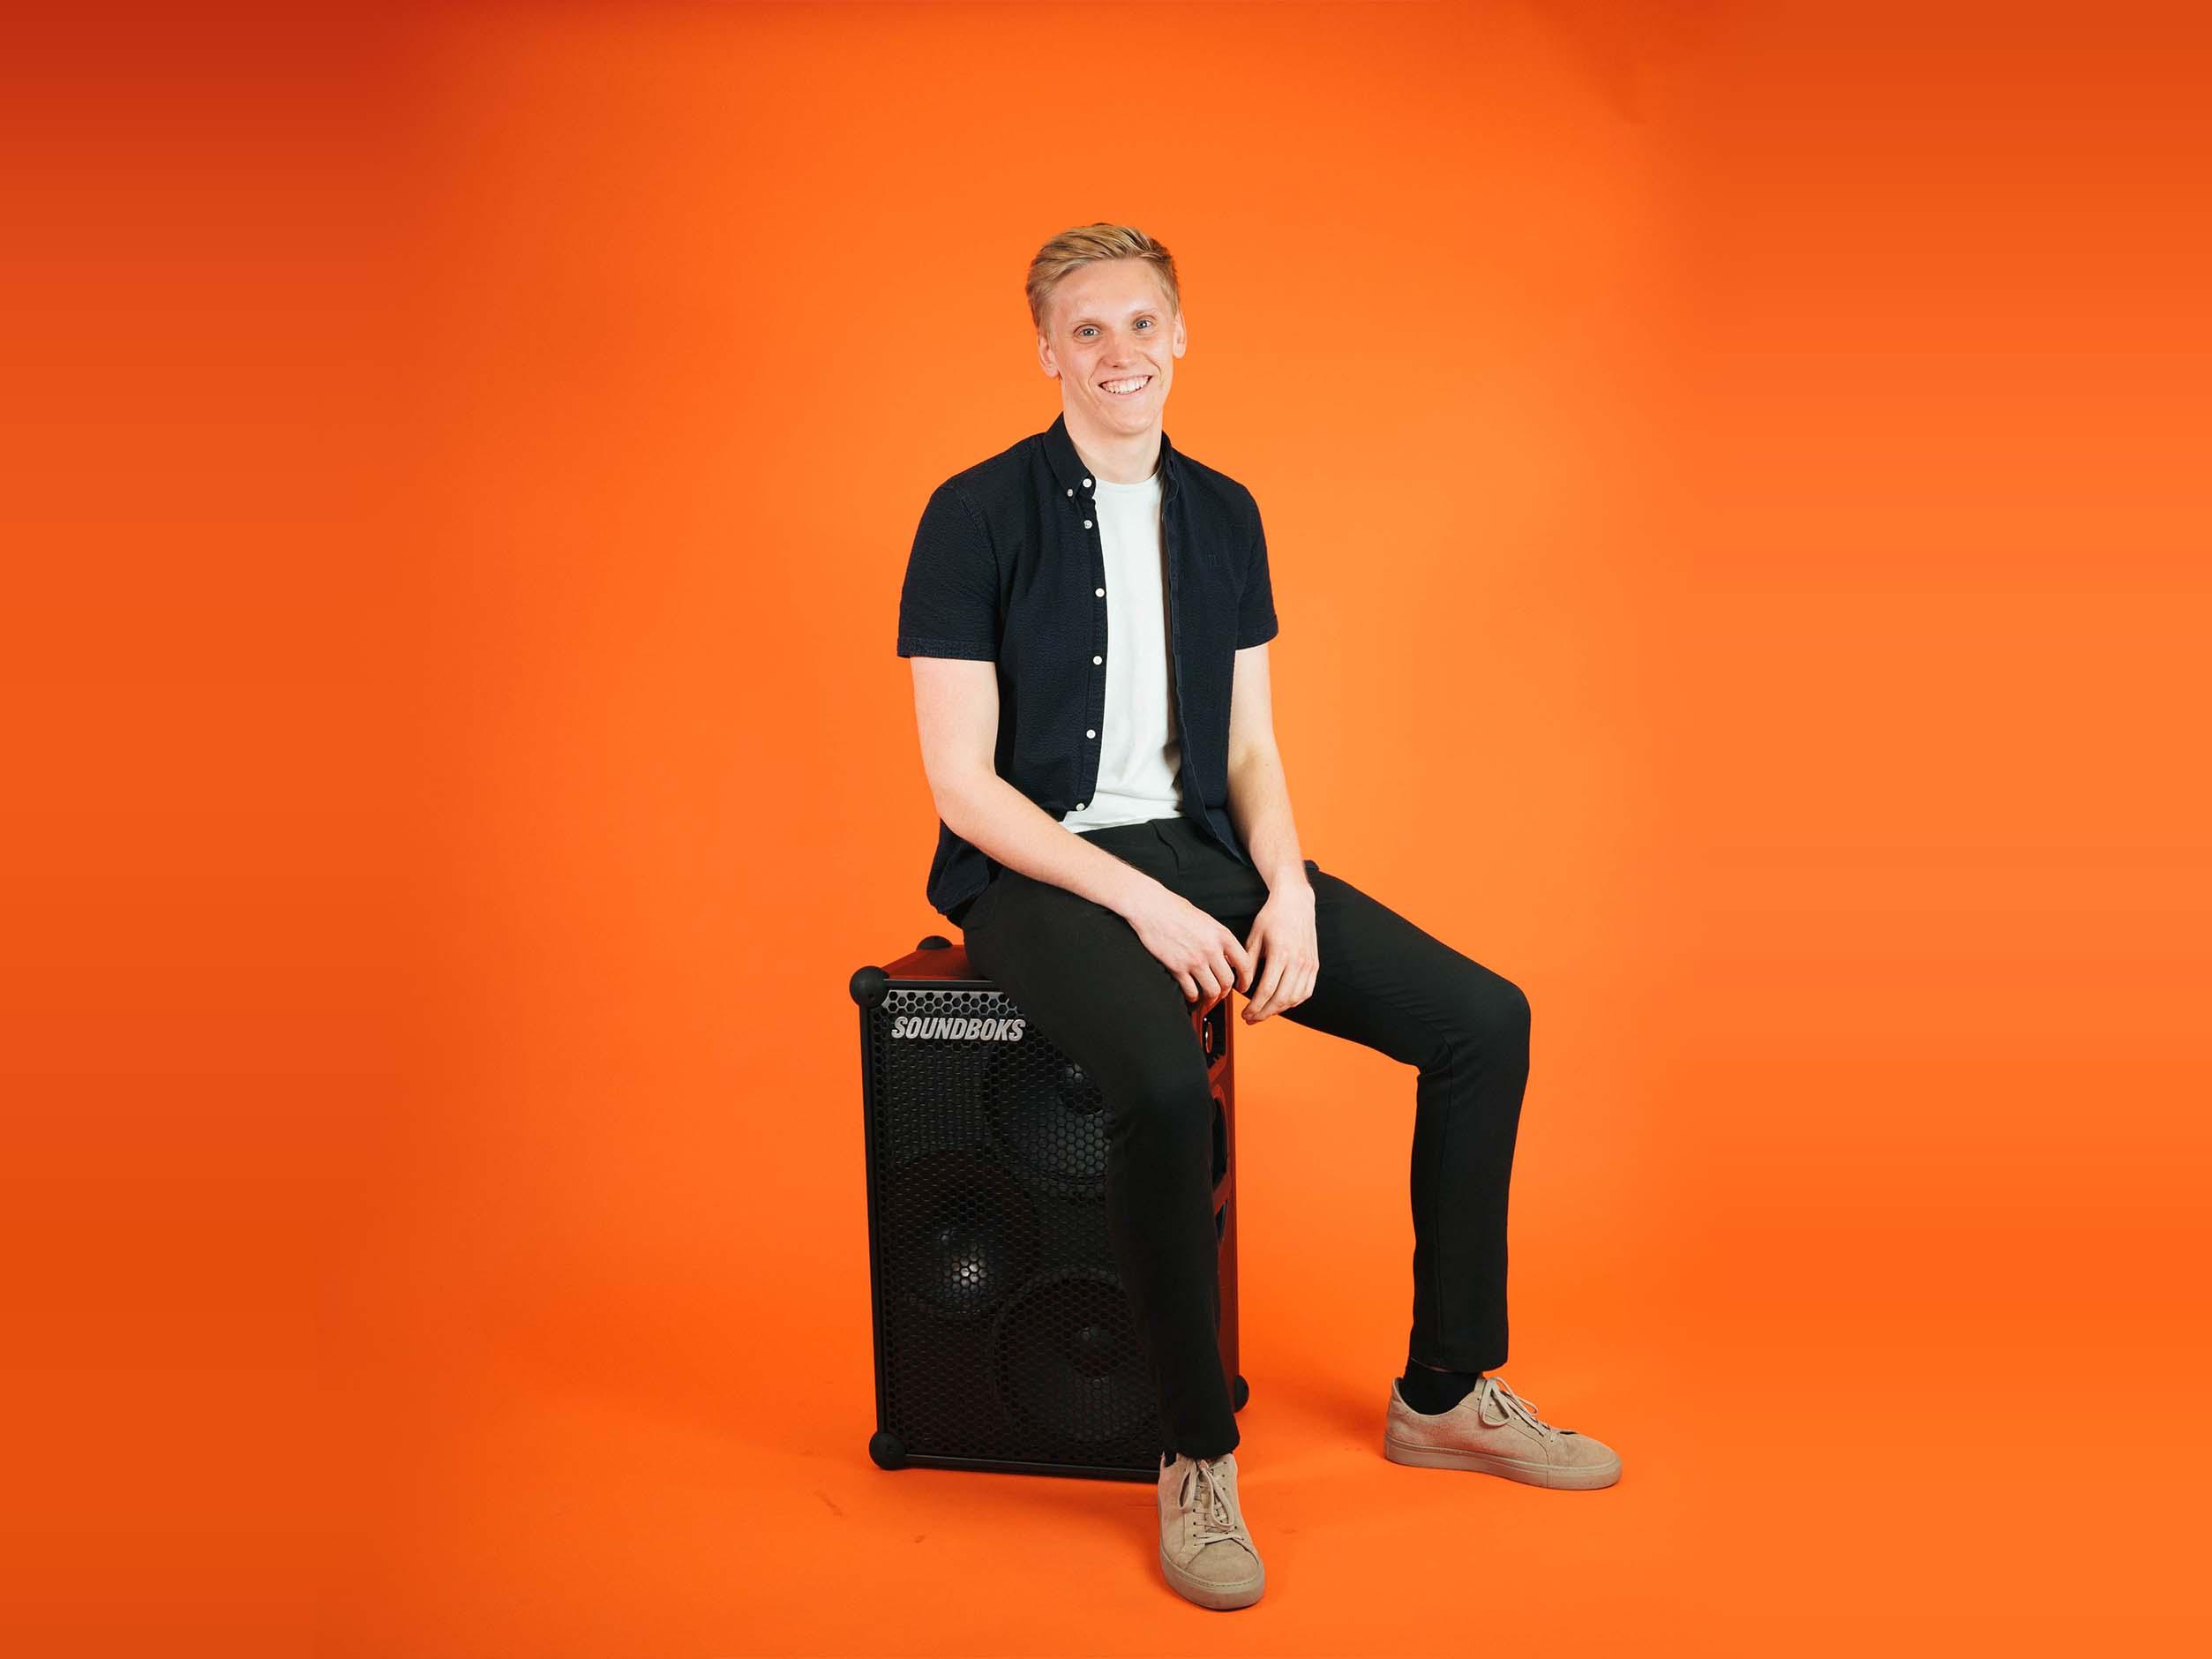 Sebastian soundboks employee, sitting with a SOUNDBOKS in front of an orange background